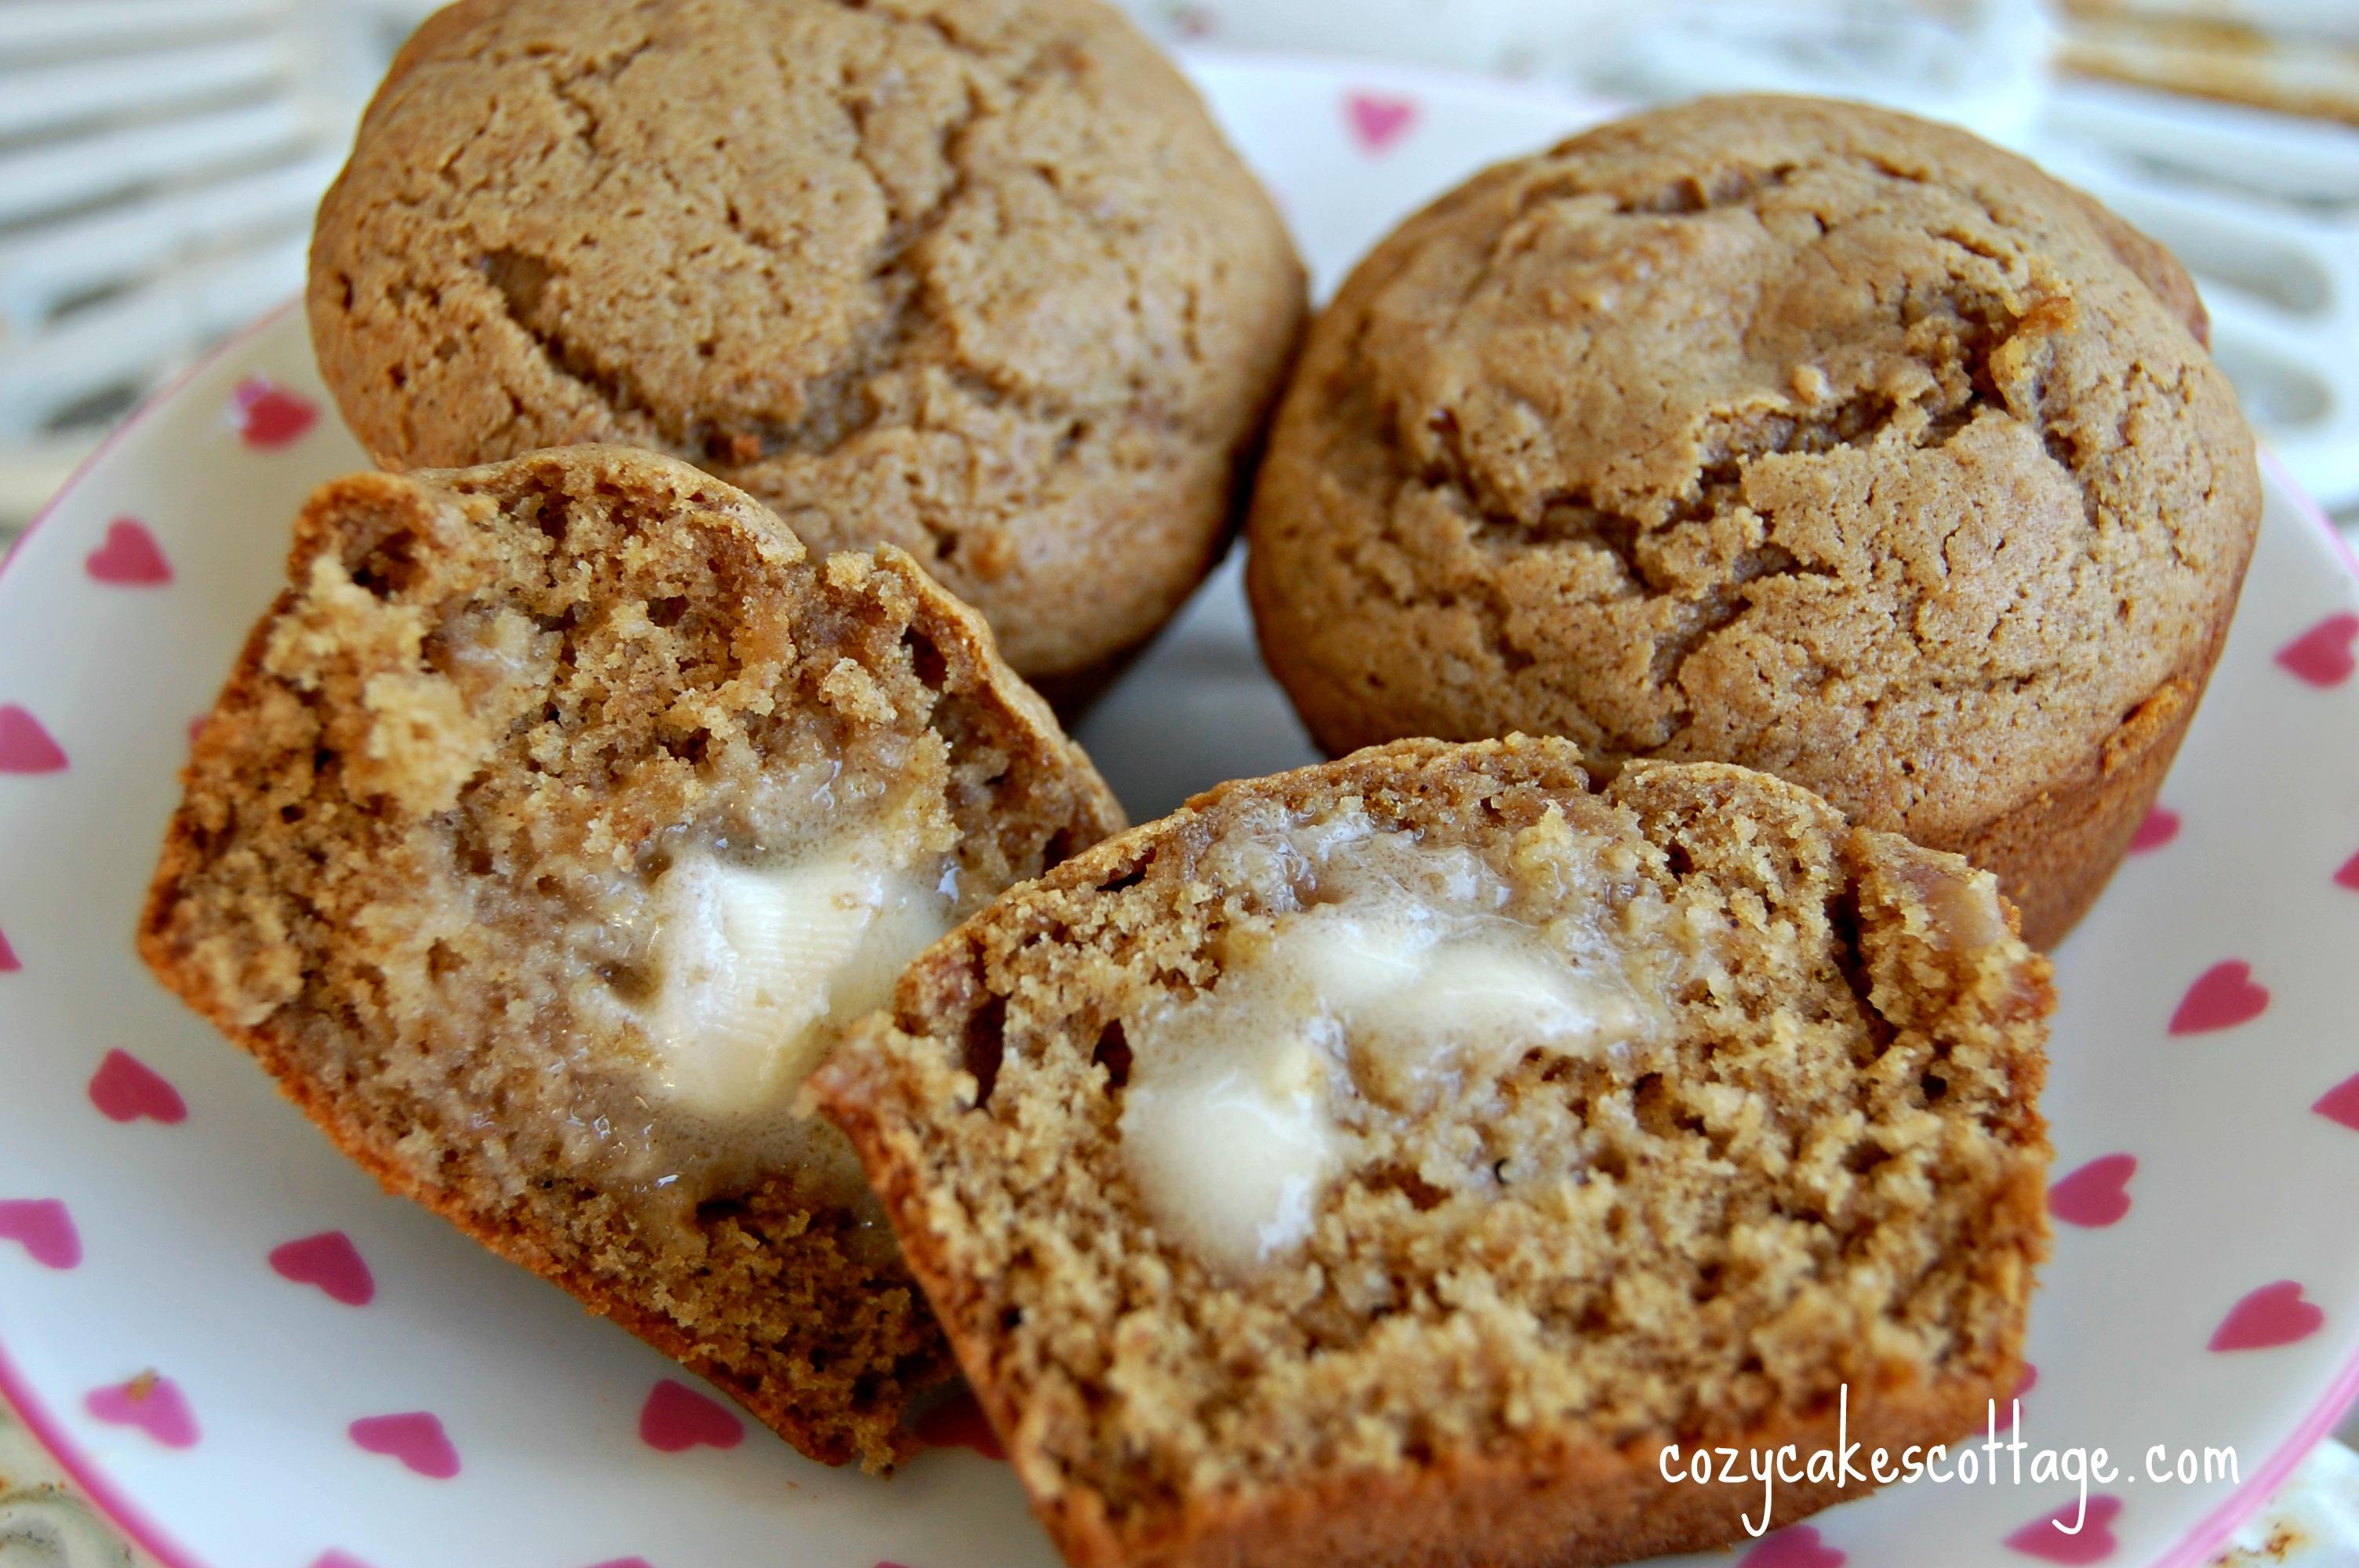 Recipe: Applesauce muffins | Cozycakes Cottage